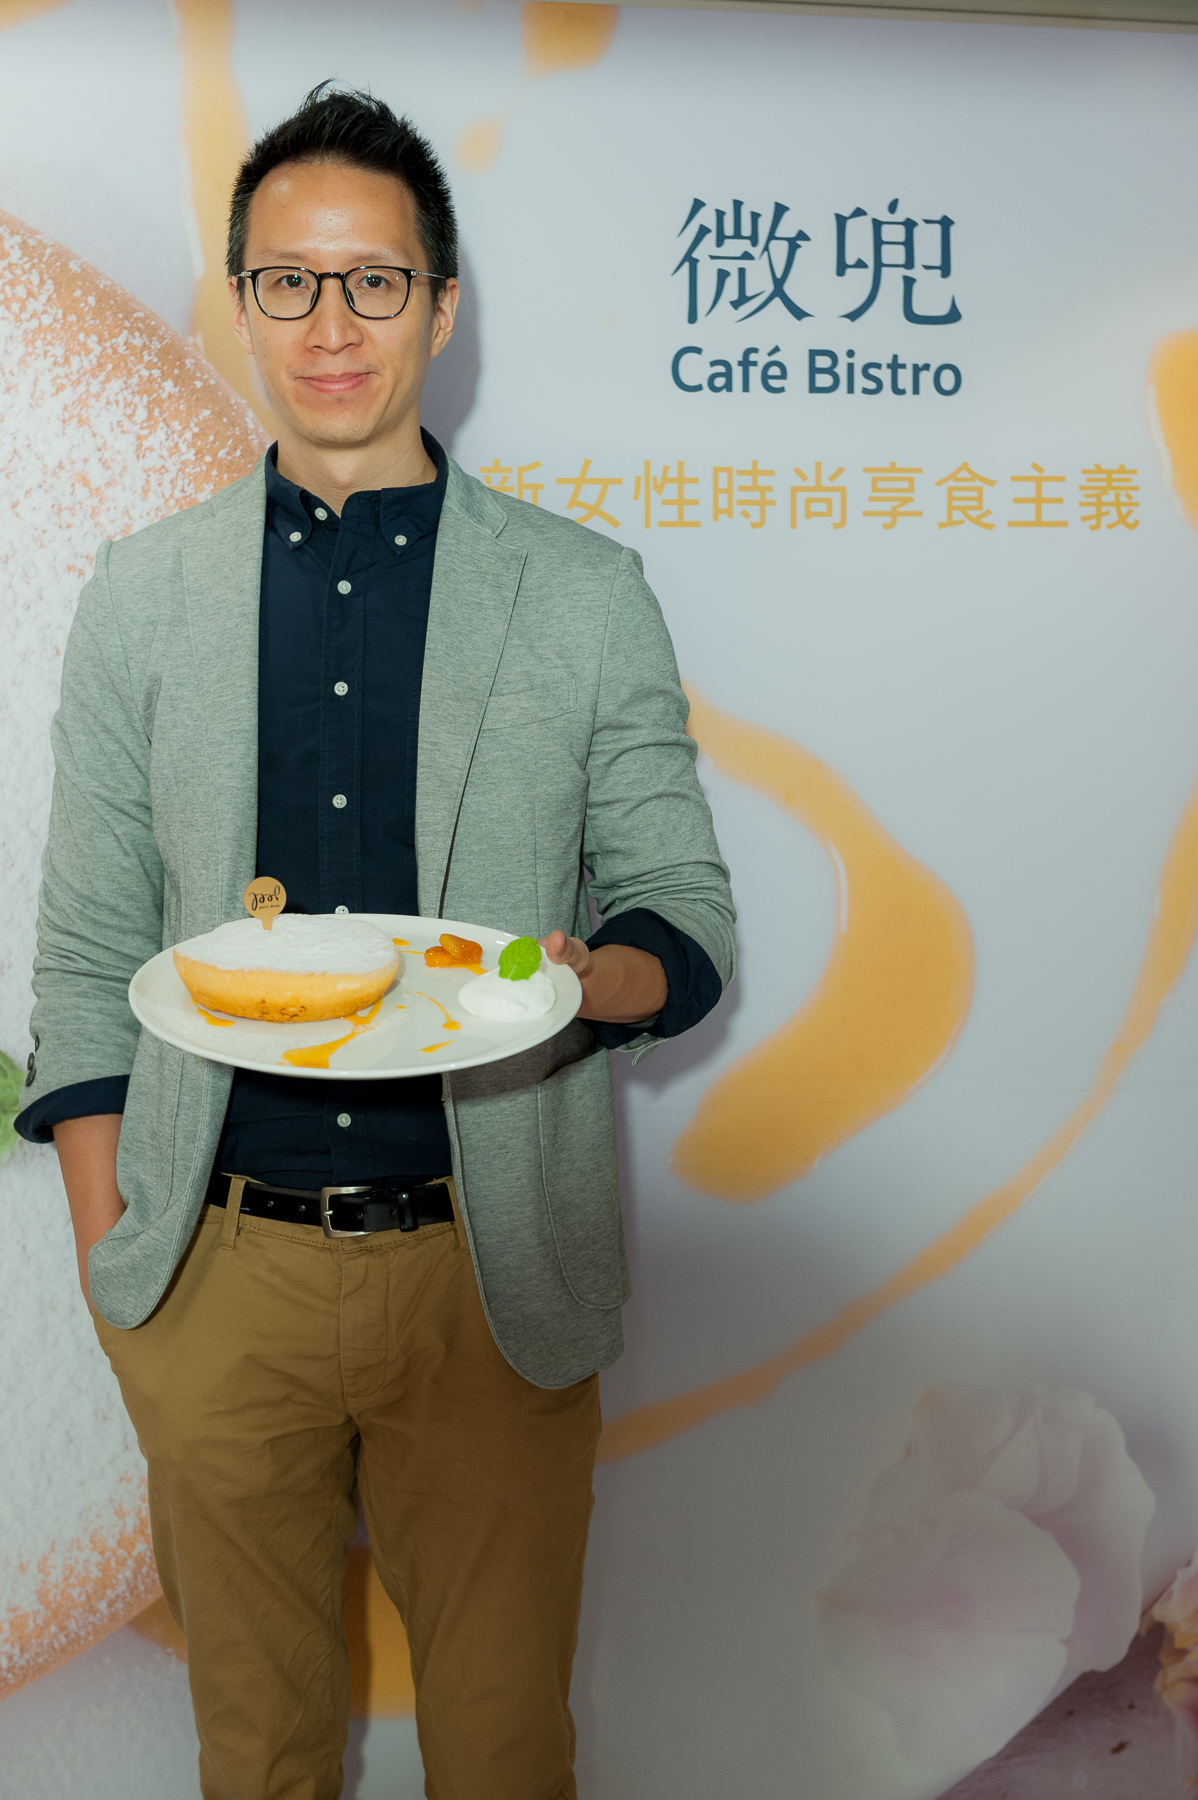 petit doux『微兜Caf Bistro』正式開幕,品牌營運長吳建辰首推瓦帕鬆餅,打造新女性時尚享食主義